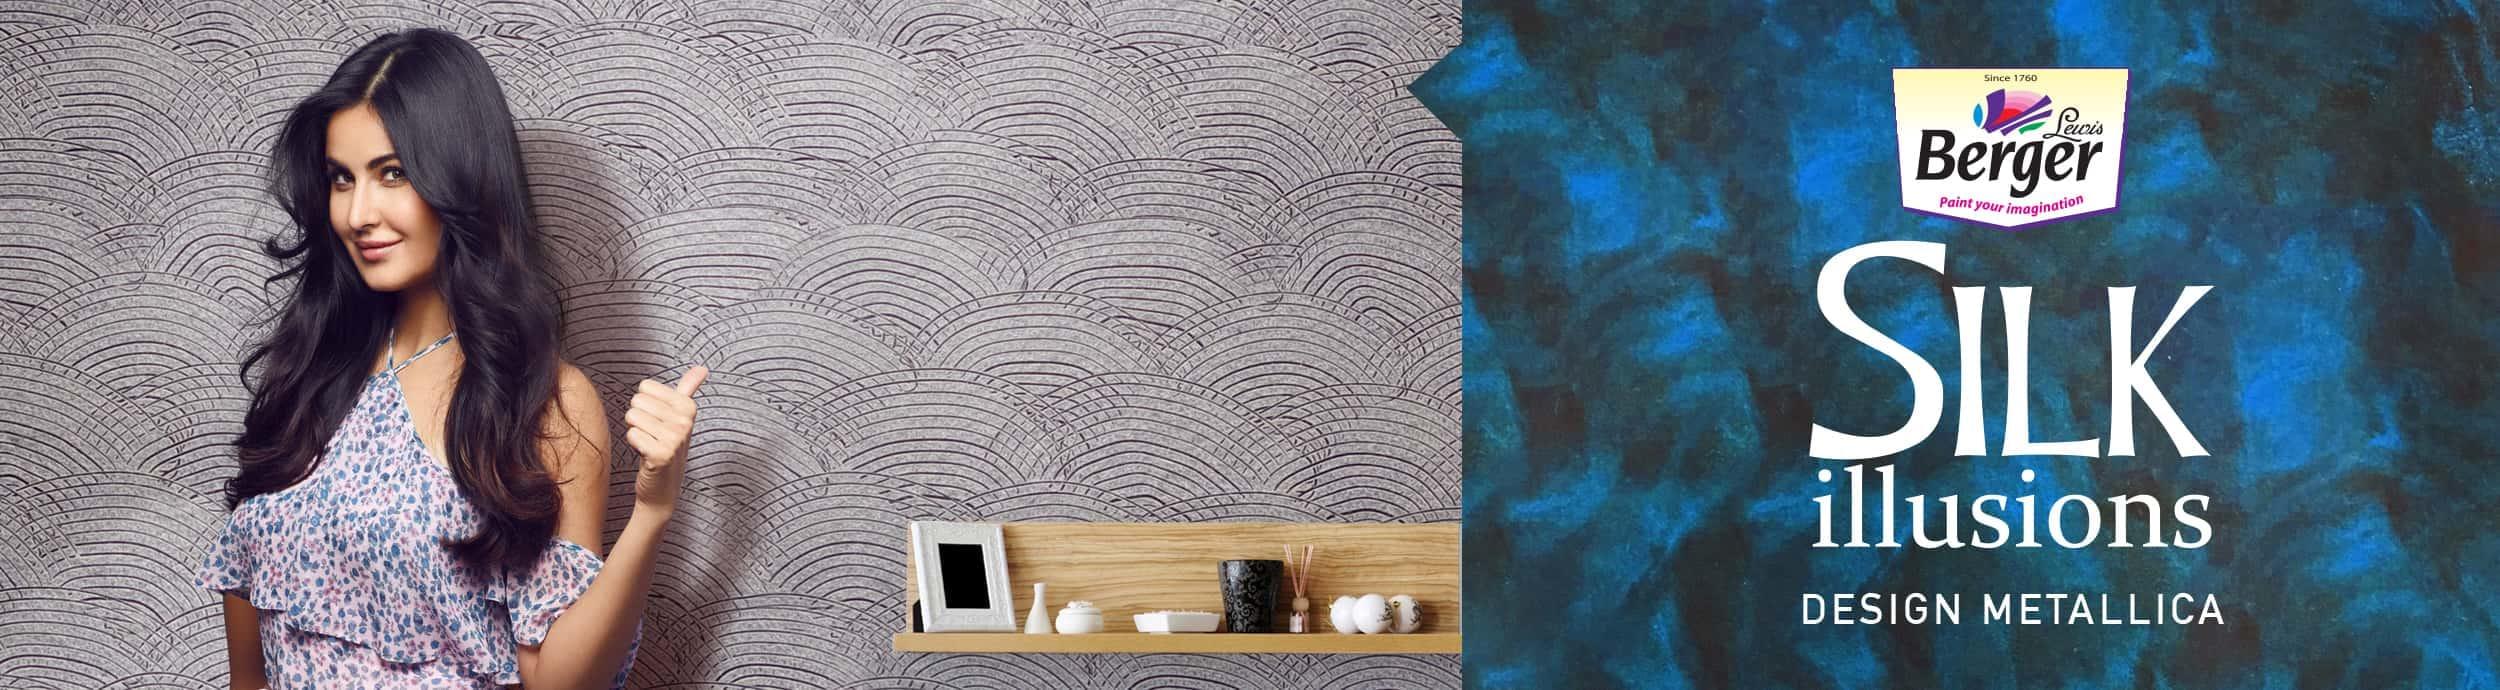 silk illusions design metallica designer wall paints with